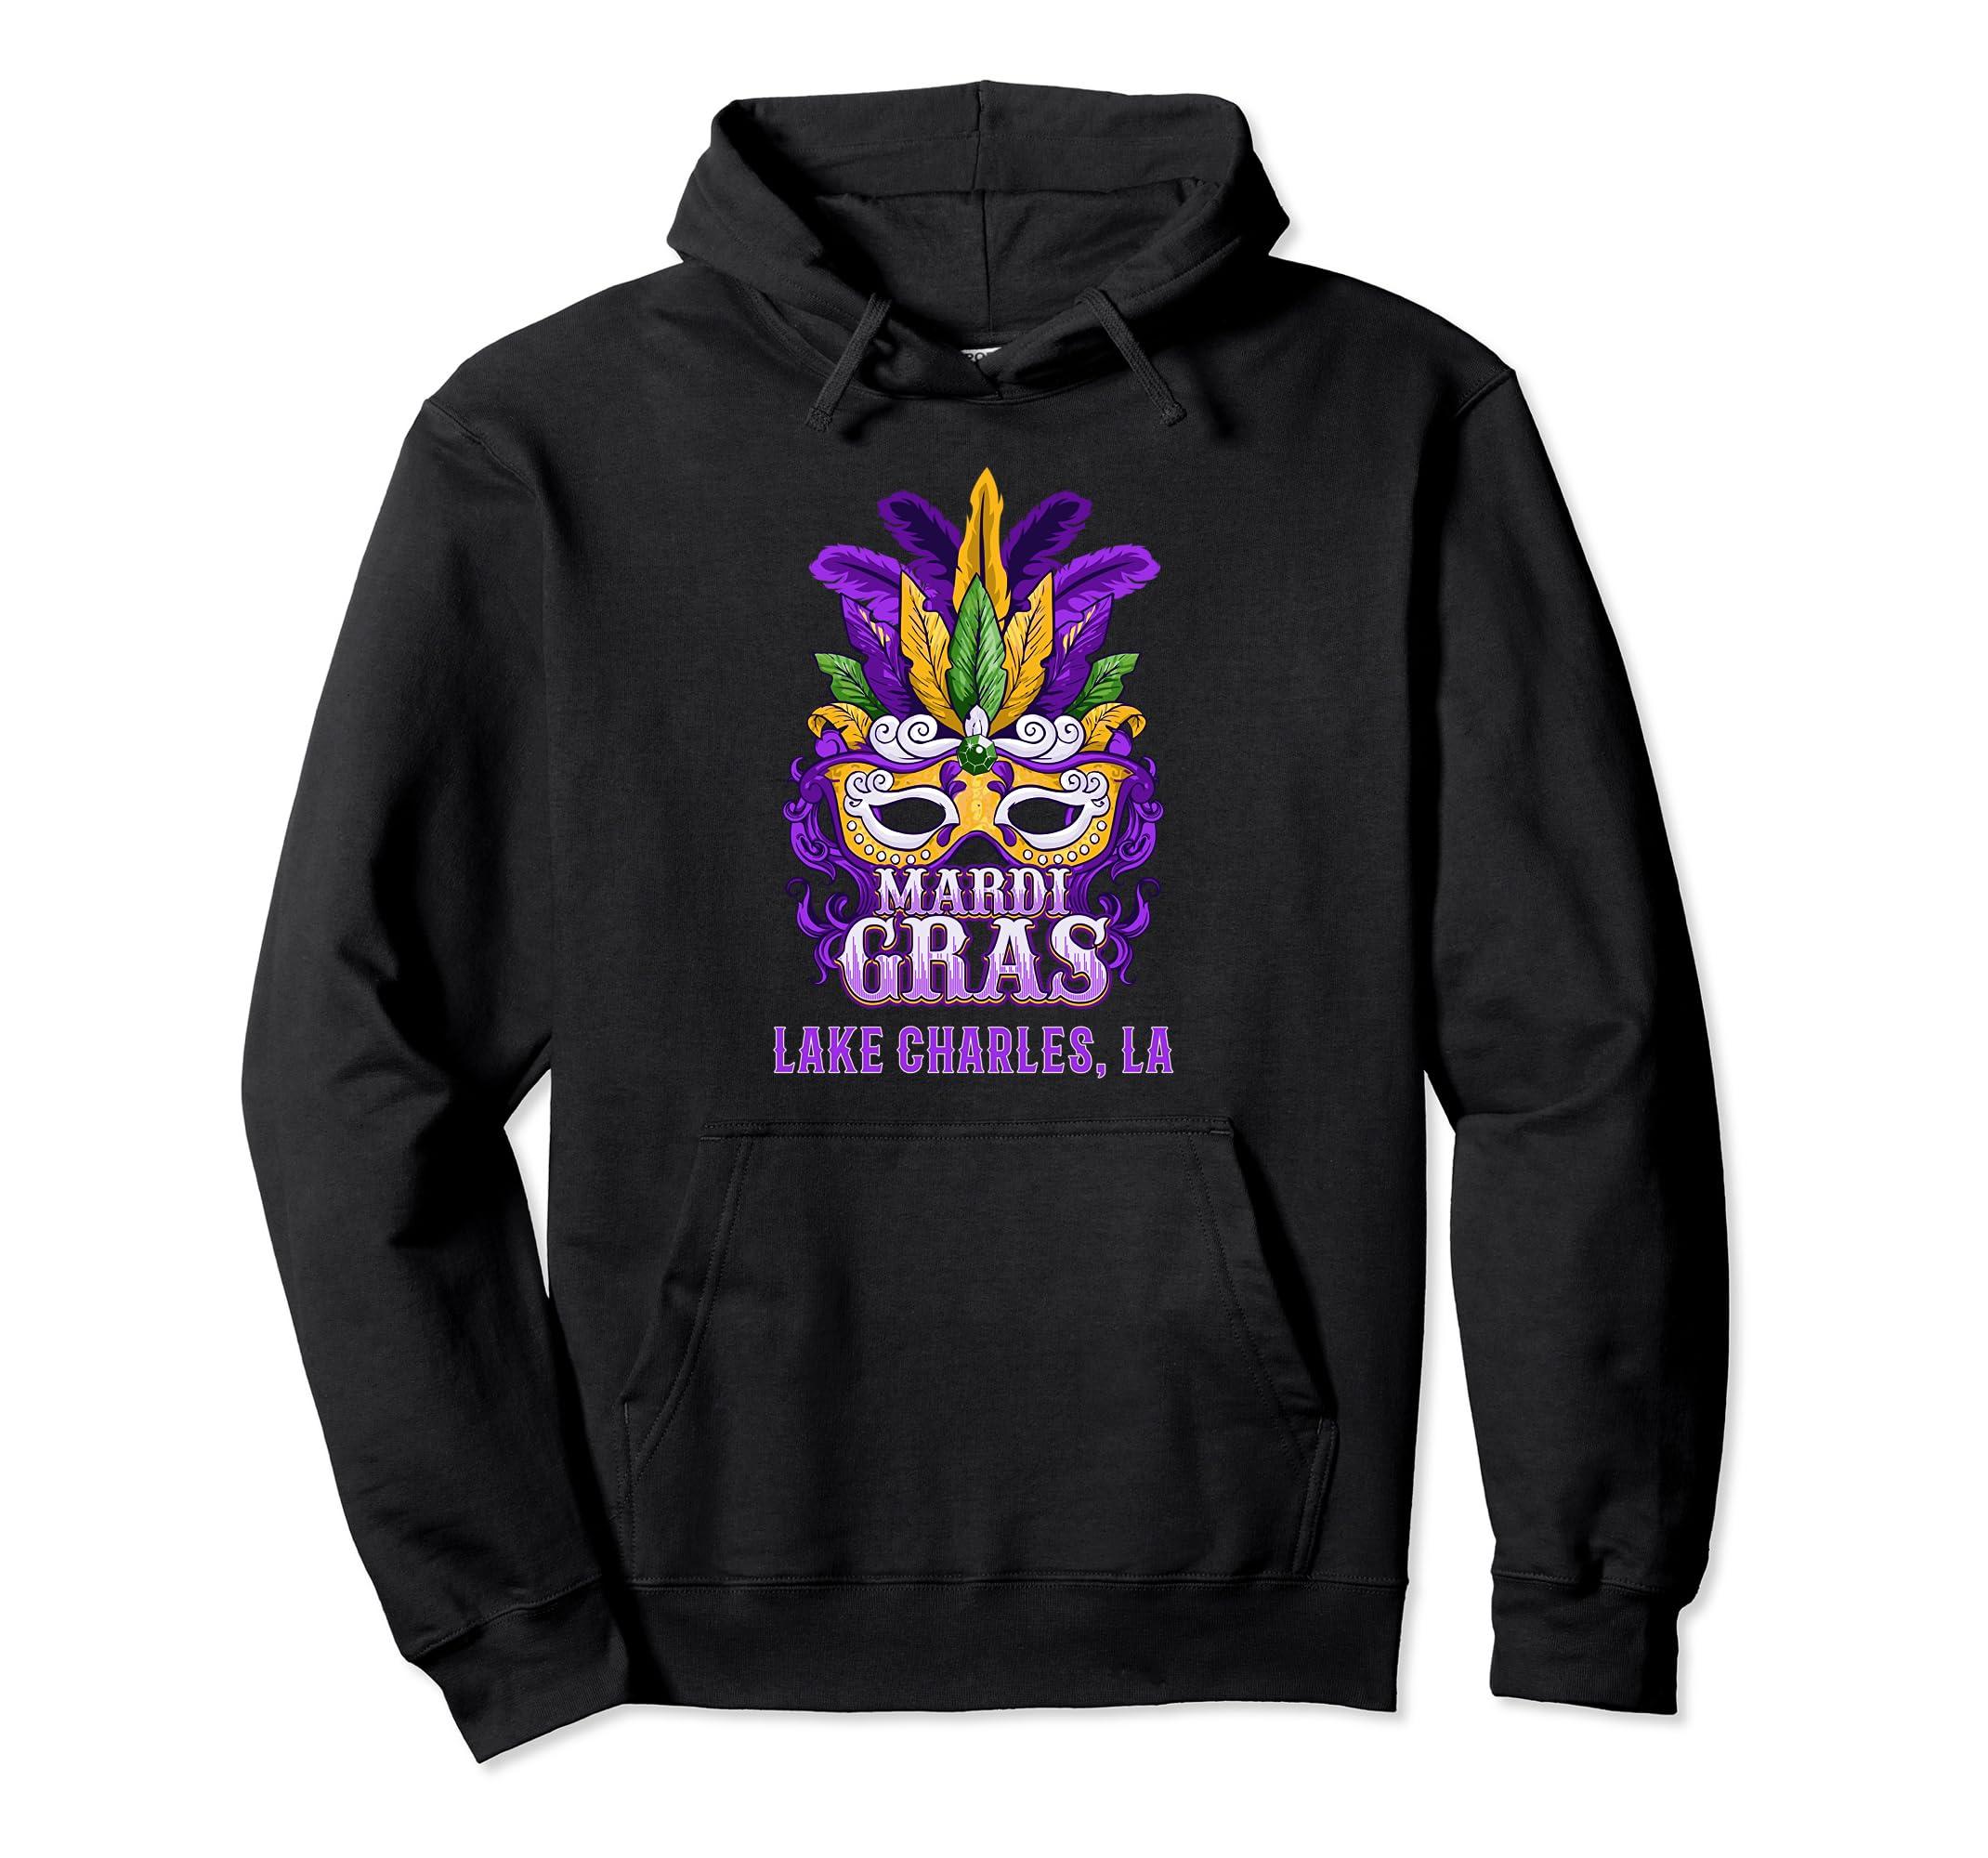 Mardi Gras Parade Lake Charles Hoodie Sweatshirt Mask-SFL